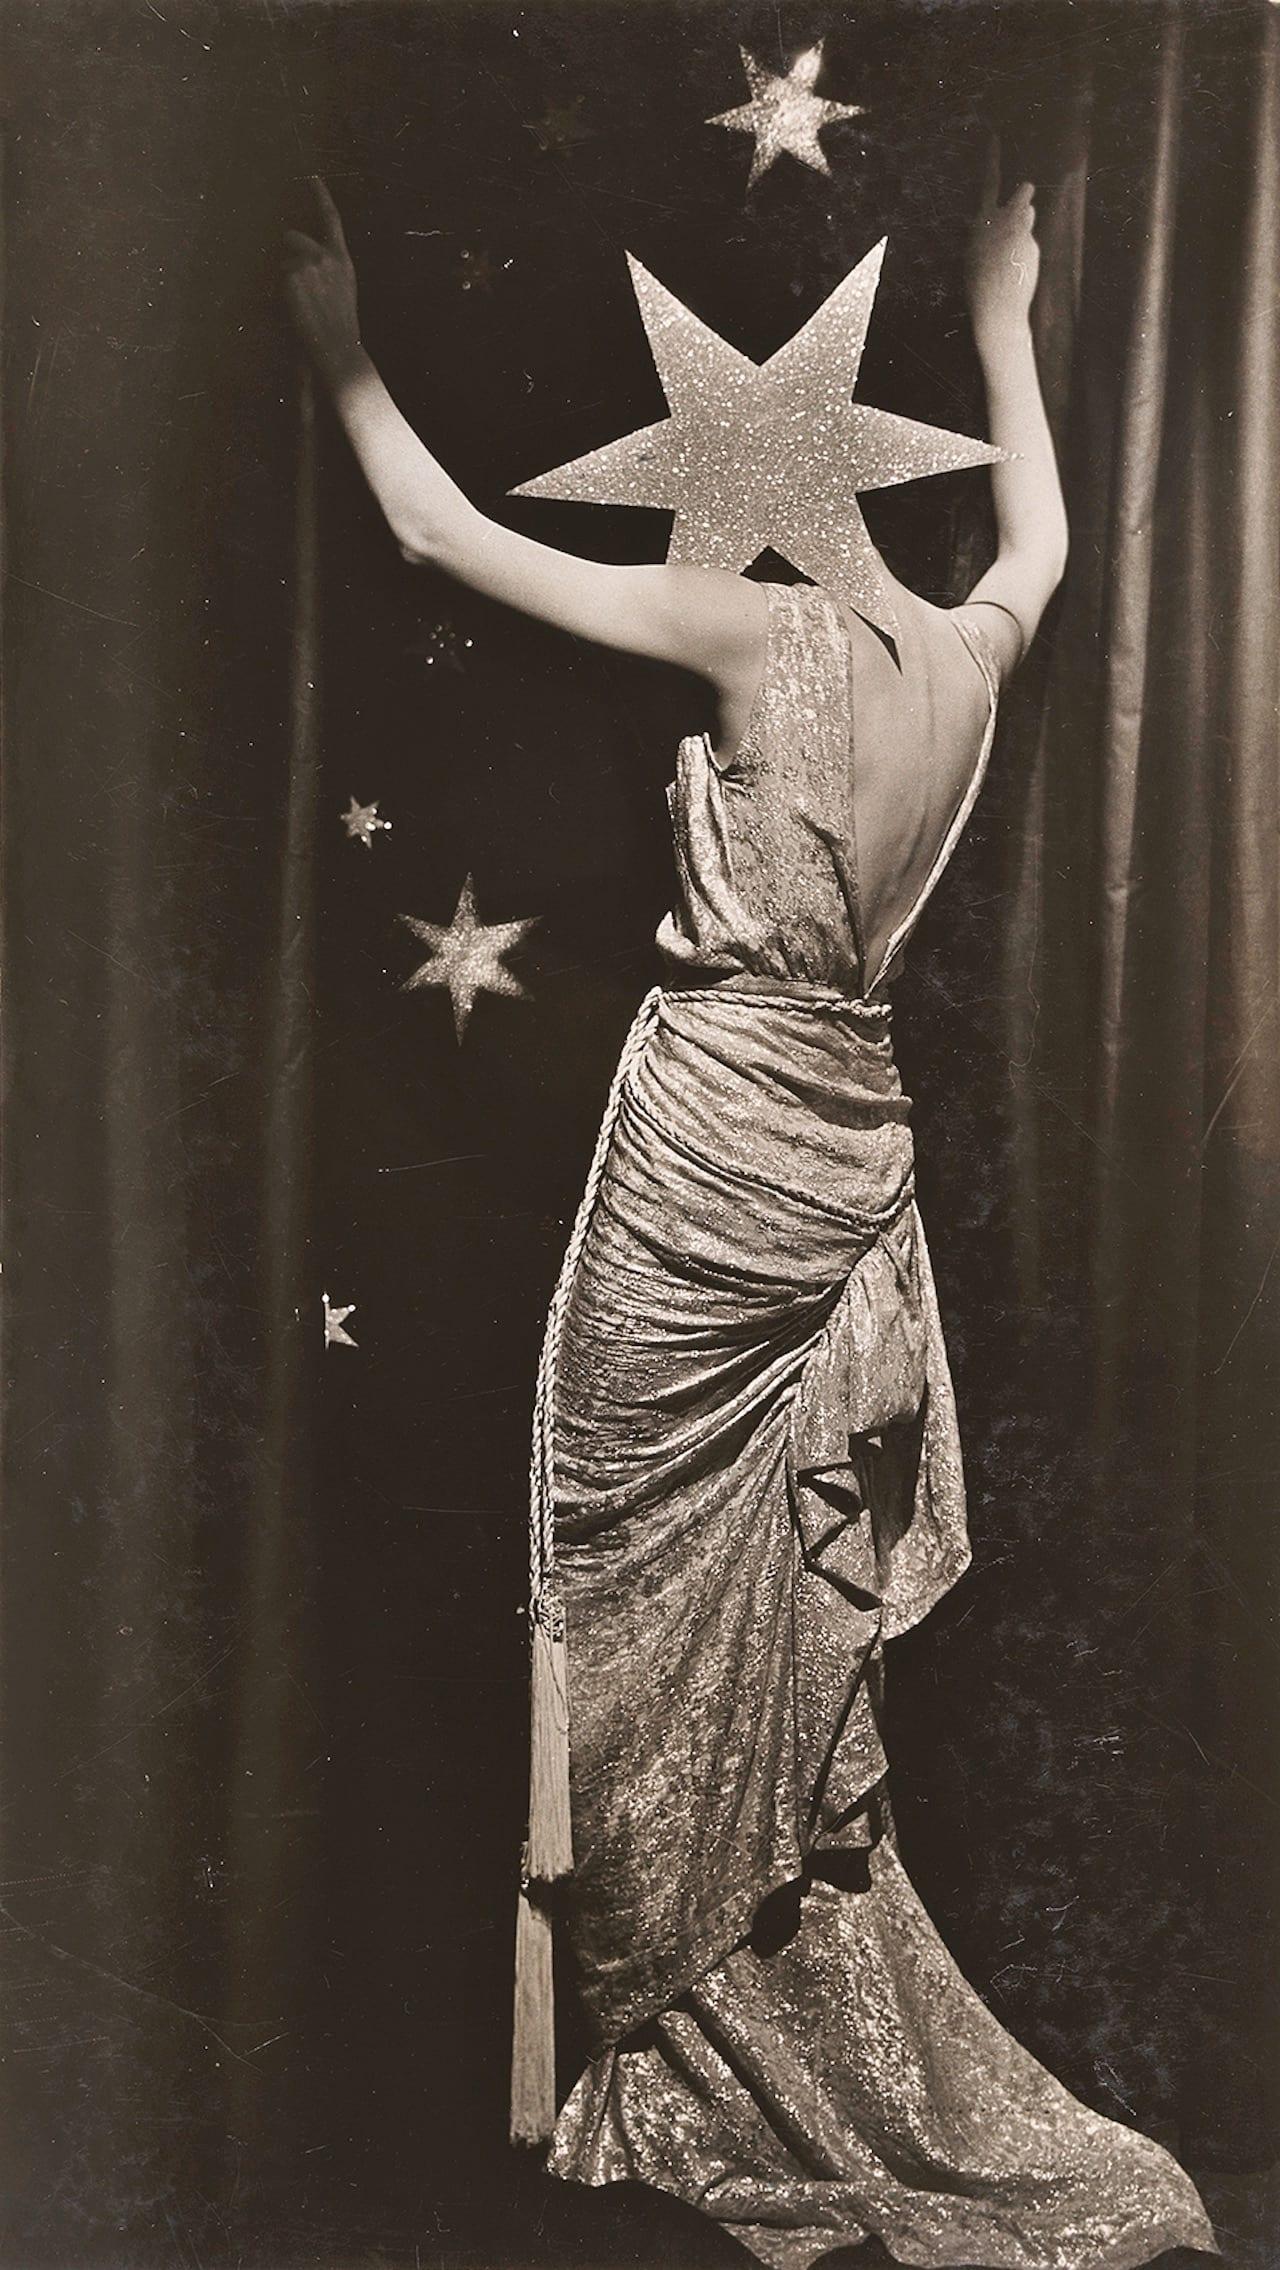 Dora Maar: A solo retrospective – British Journal of Photography